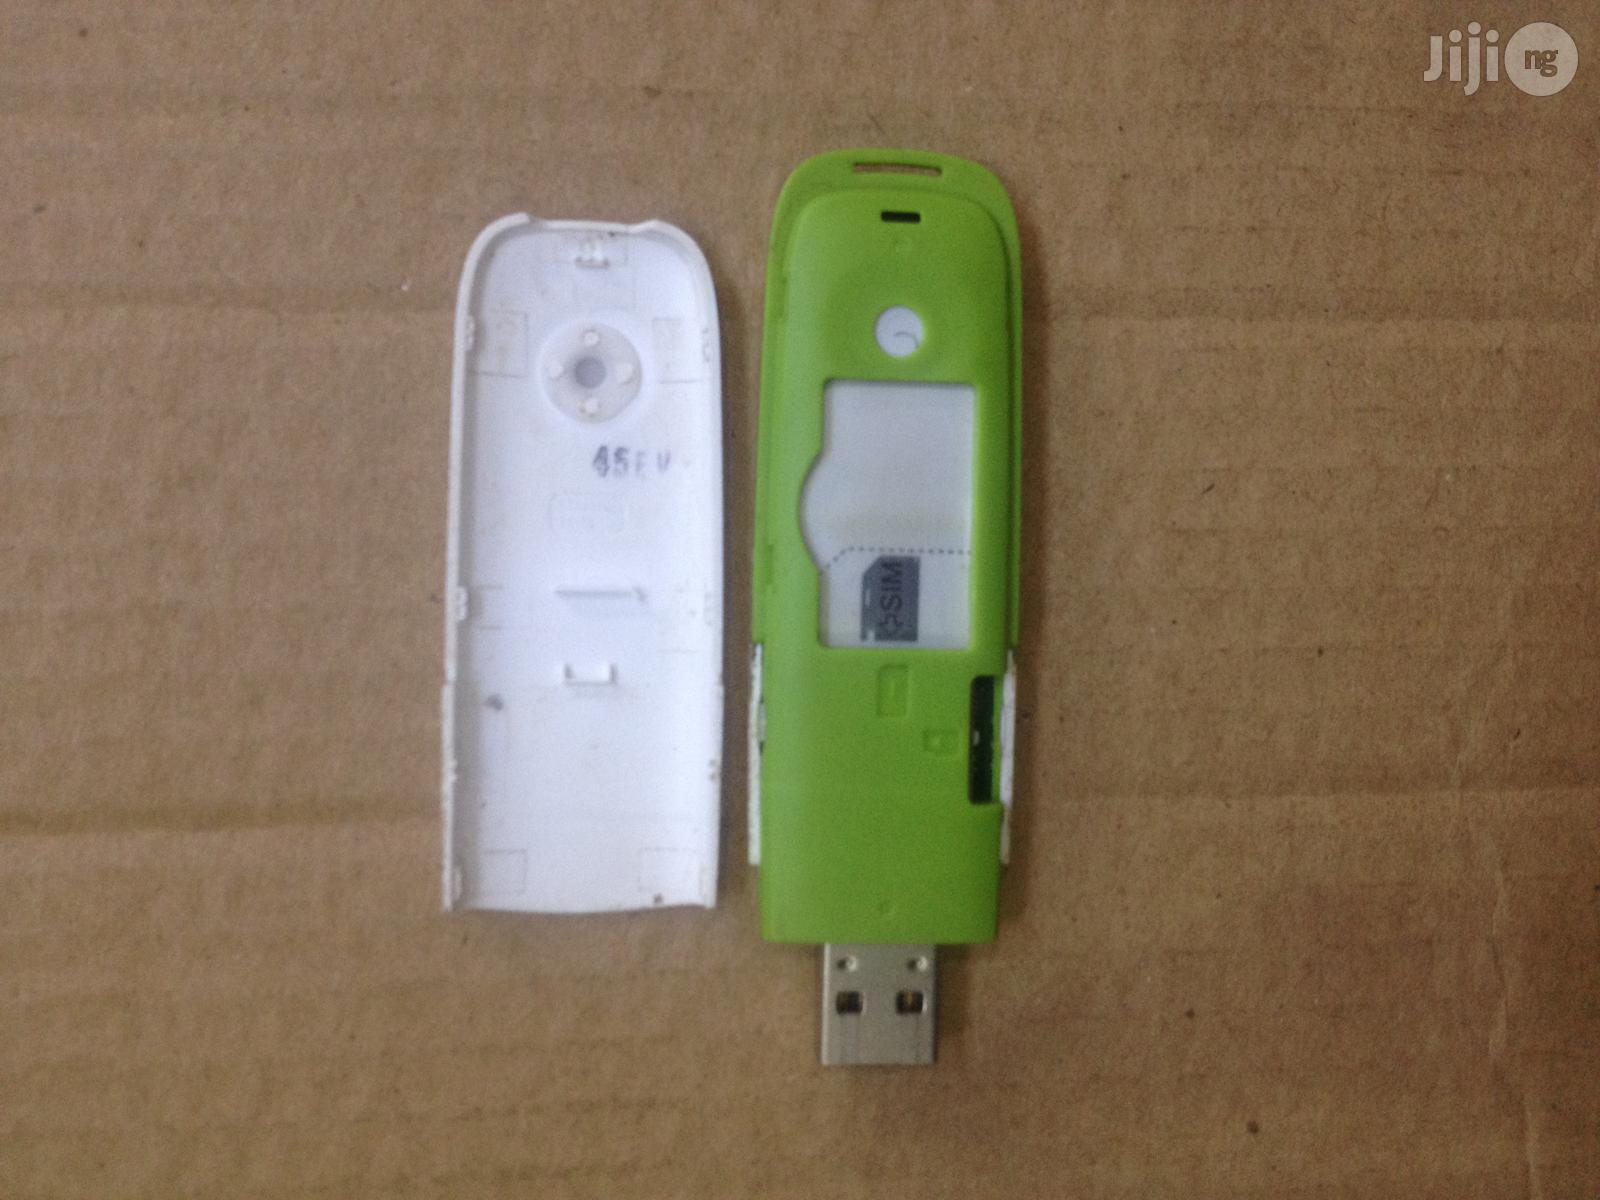 Easyblaze HSUPA ZTE MF190 3G Wireless Cellular Modem | Networking Products for sale in Ikeja, Lagos State, Nigeria